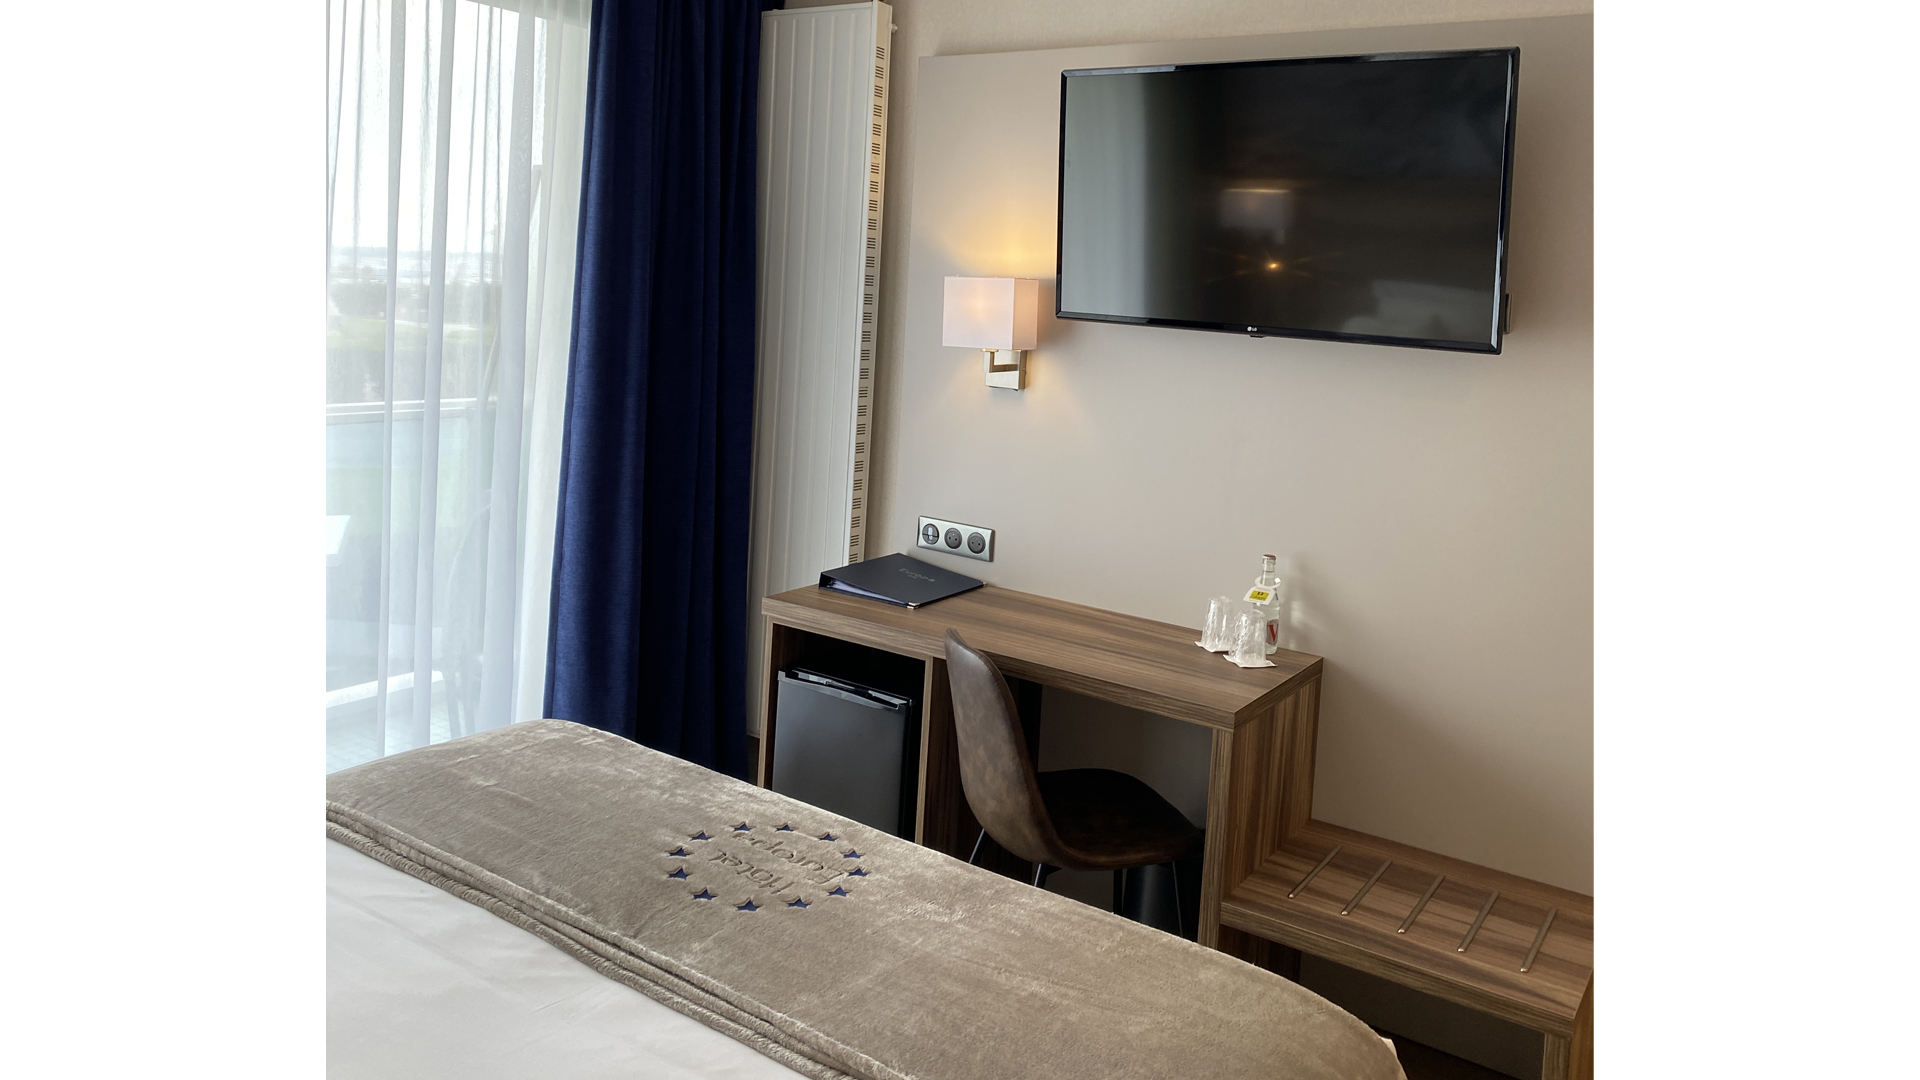 hotel-chambre-elegance-vue-jardin-quiberon-hotel-europa-diaporama2020-4